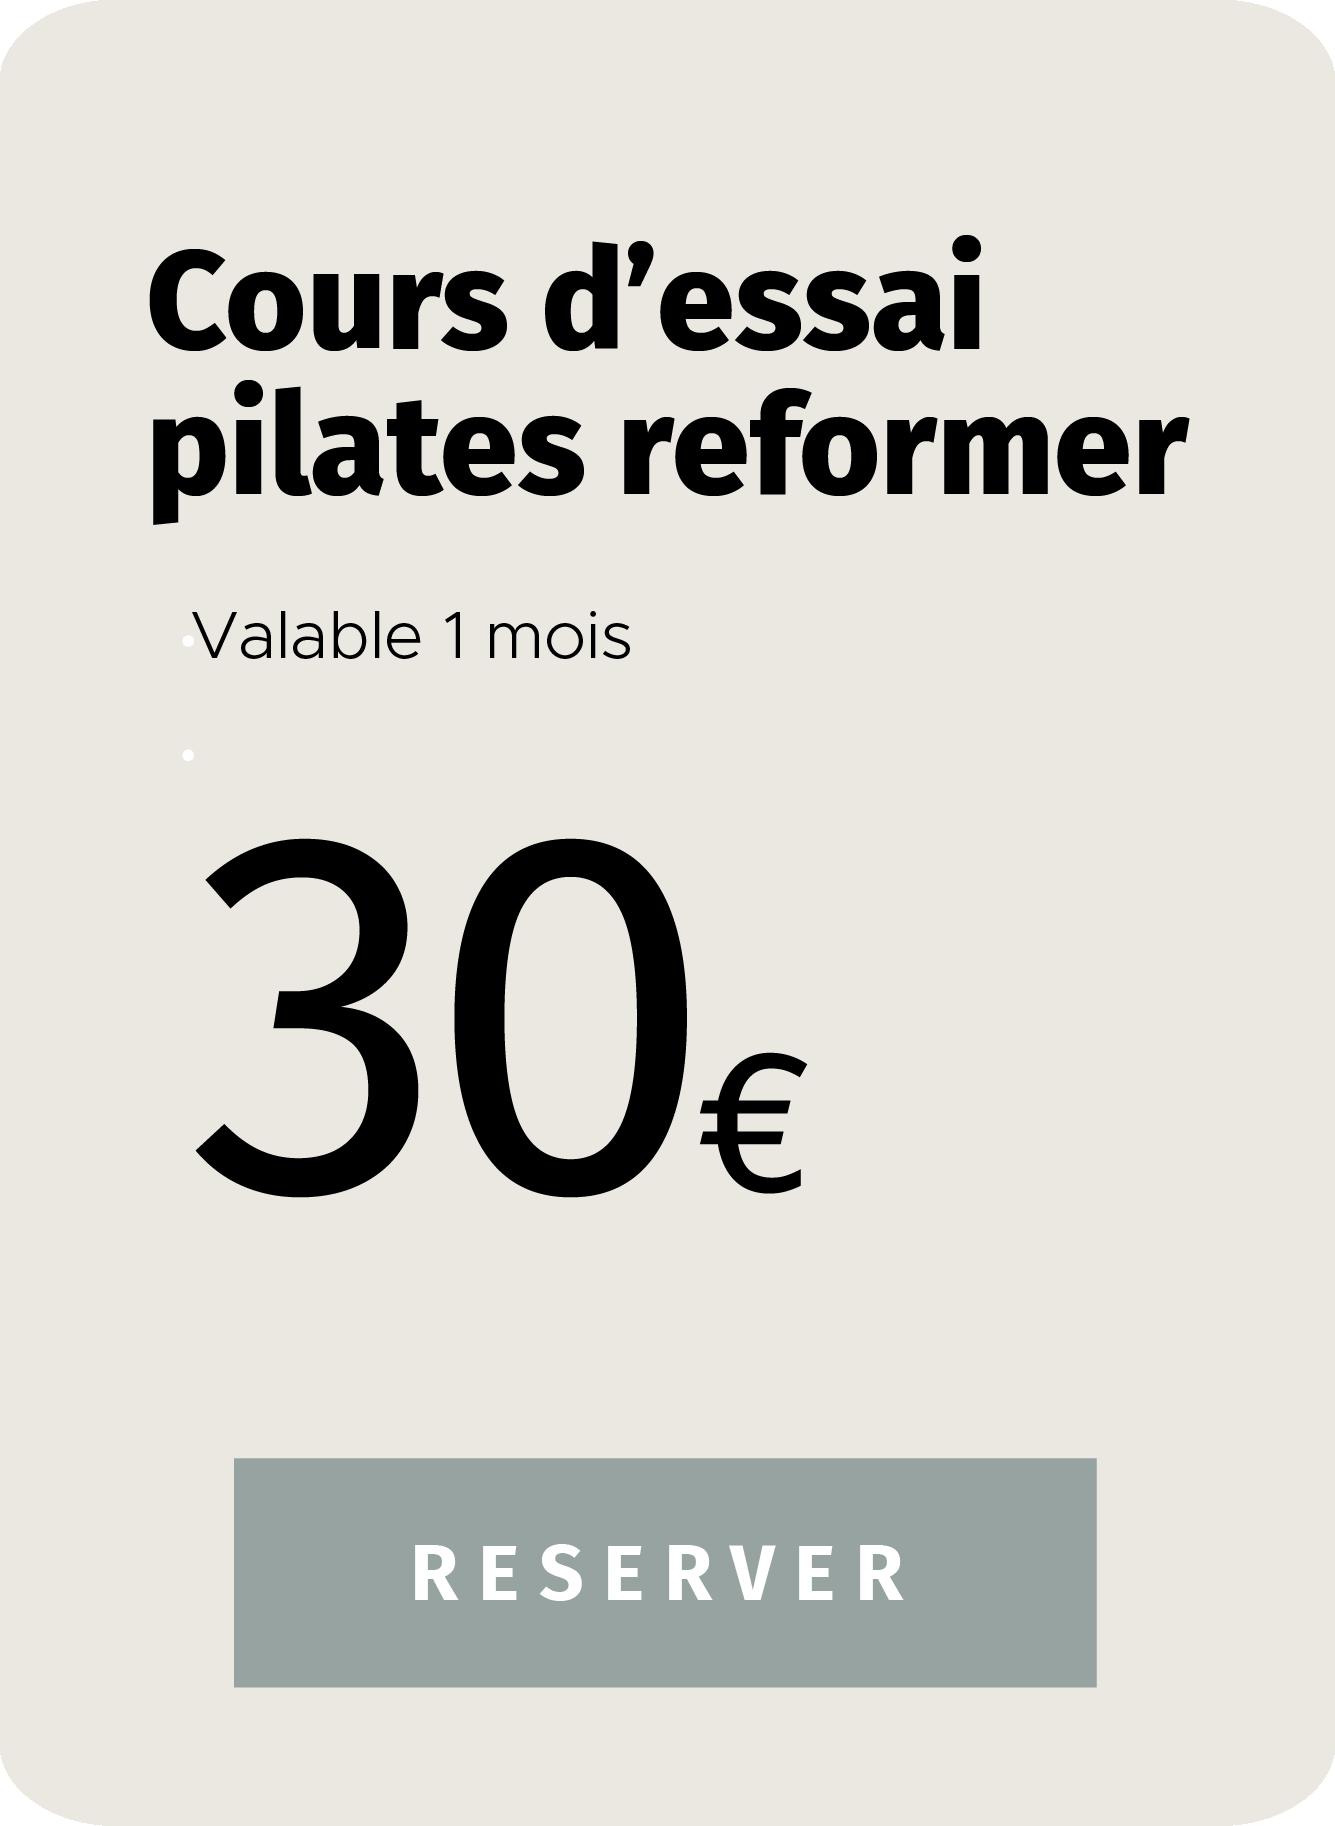 cours-essai-pilates-reformer-unite-studio-paris-2